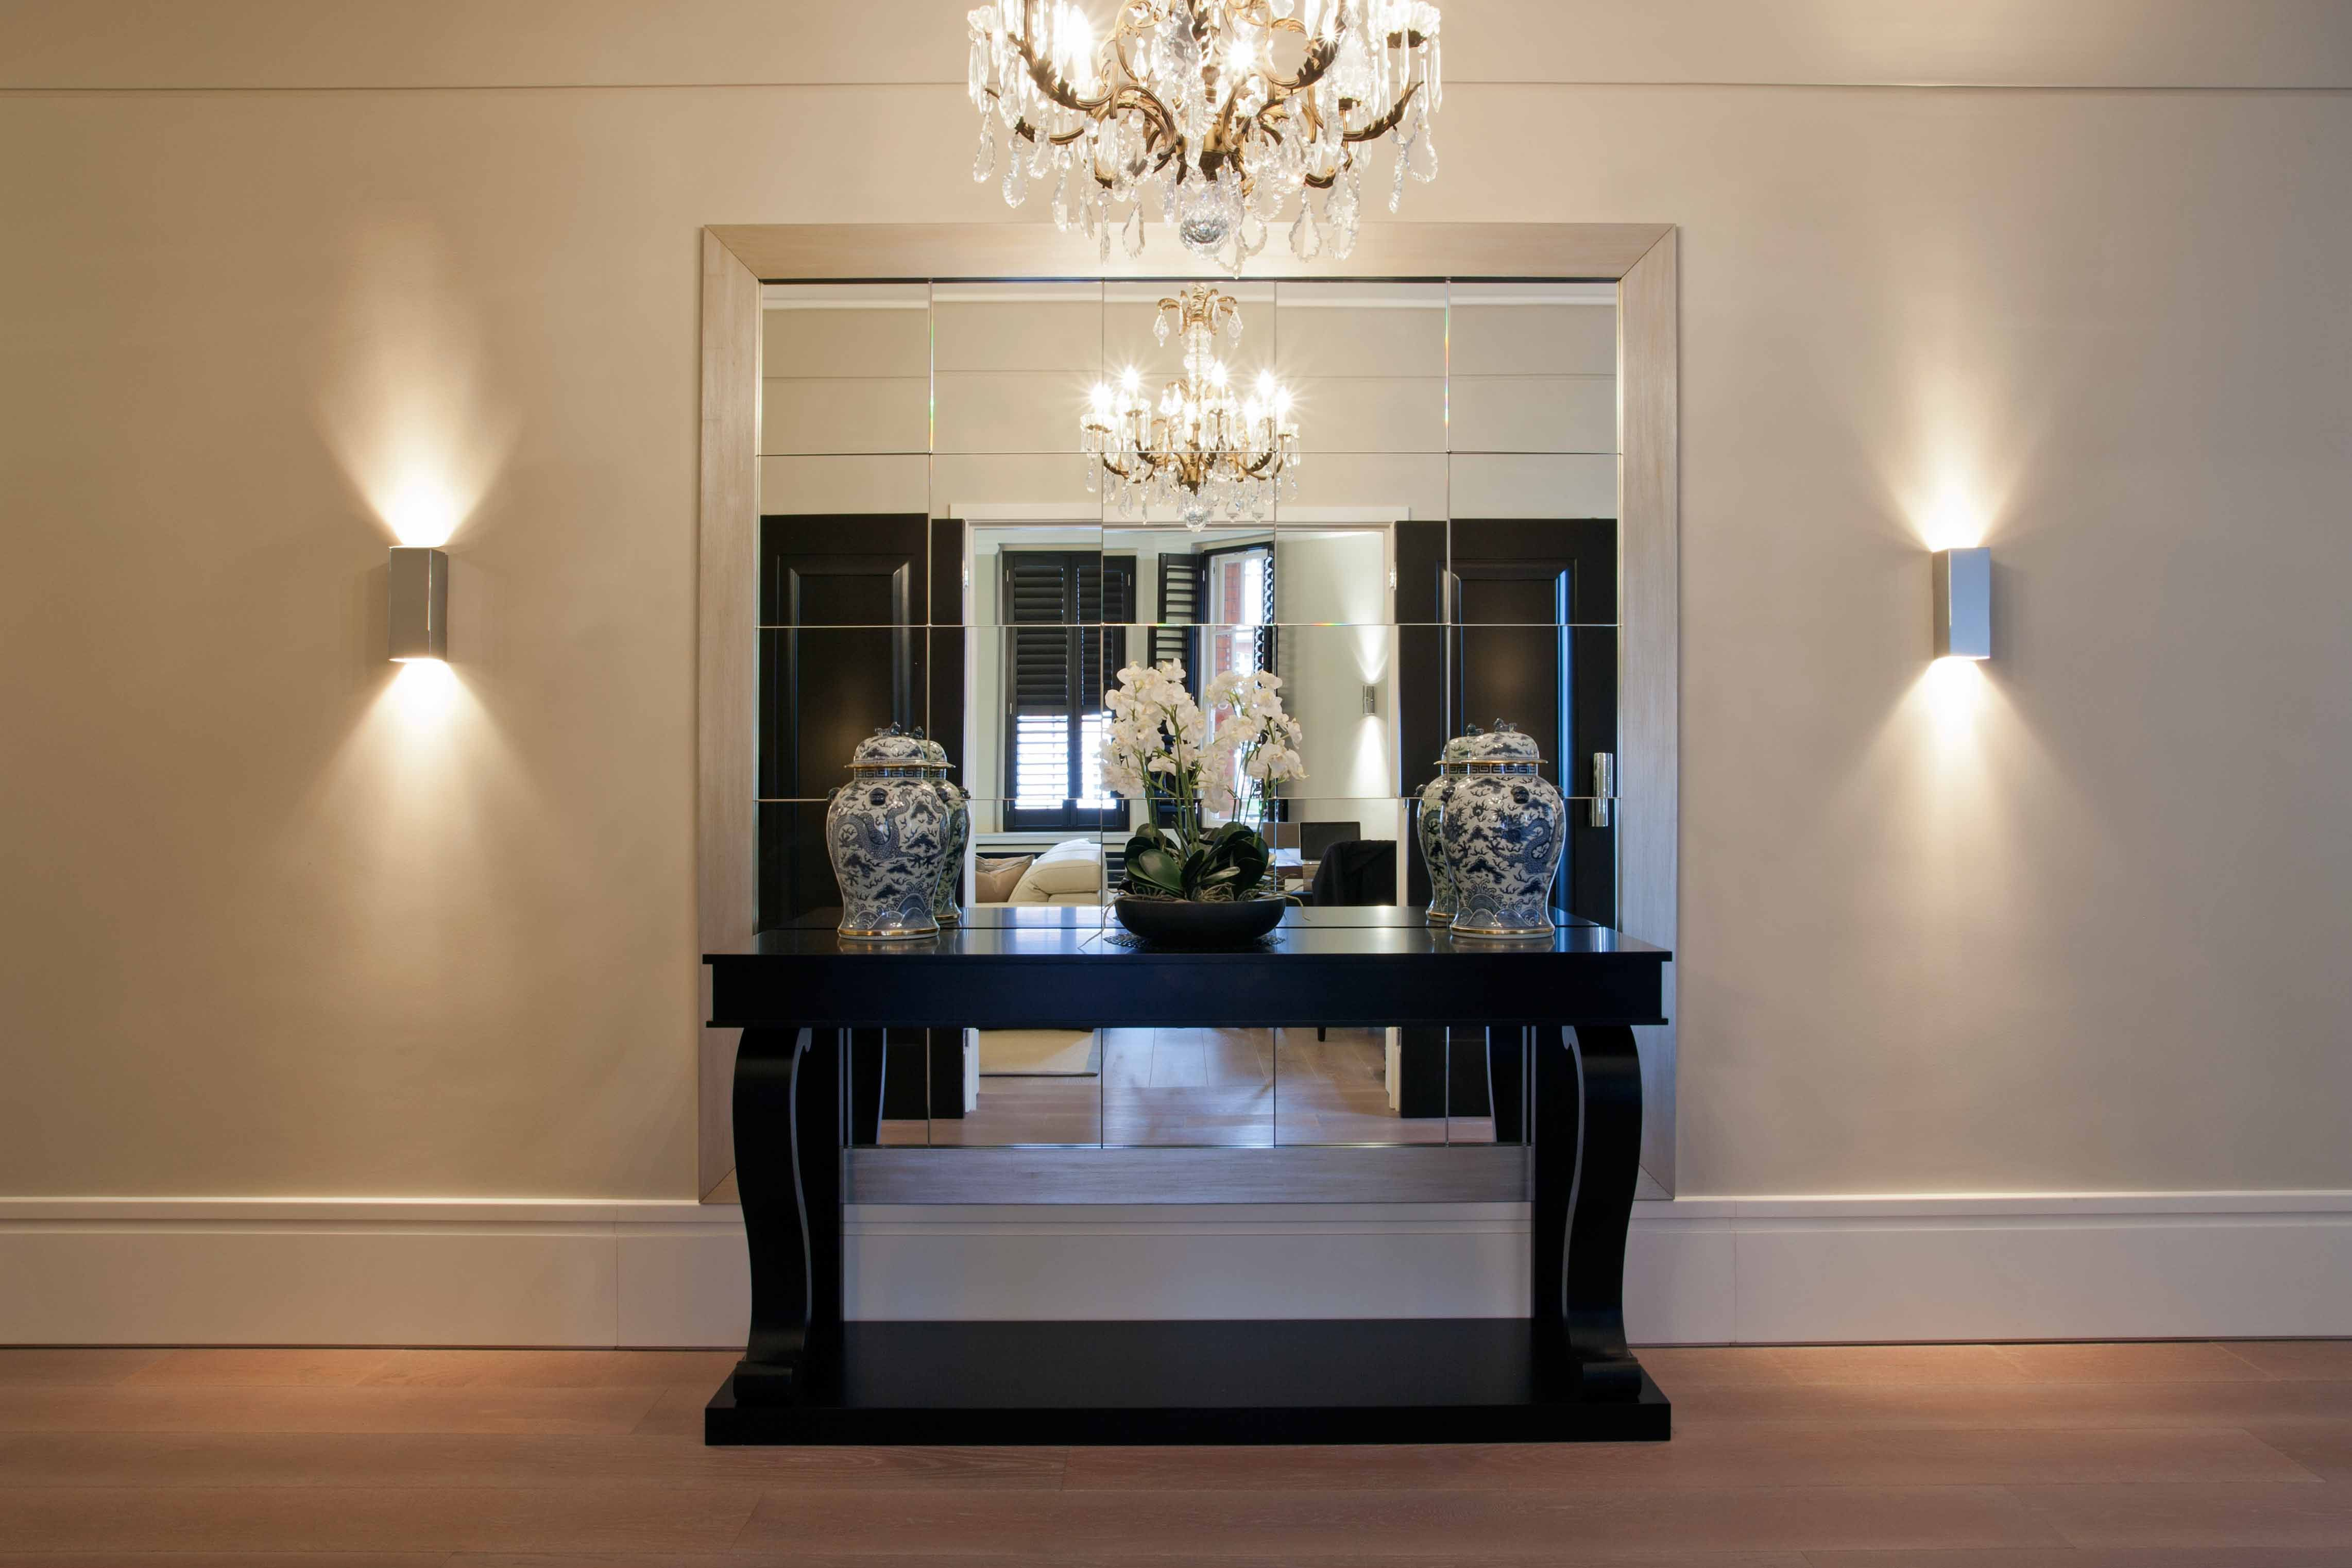 Genial The Studio Harrods   Holland Park Luxury Apartment